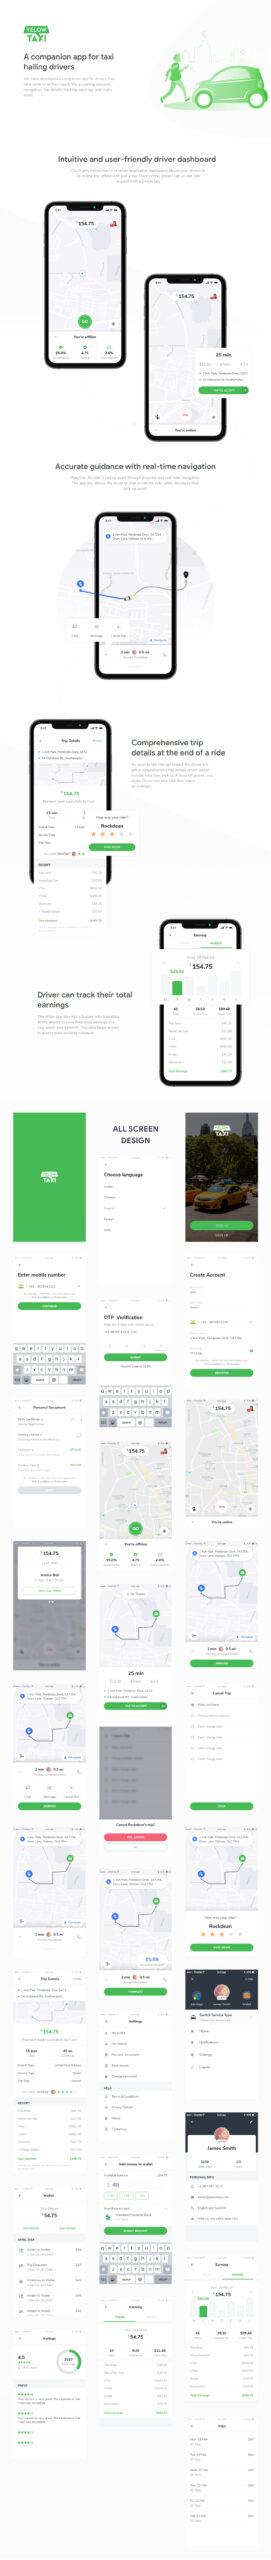 Yellow出租车司机应用程序插图